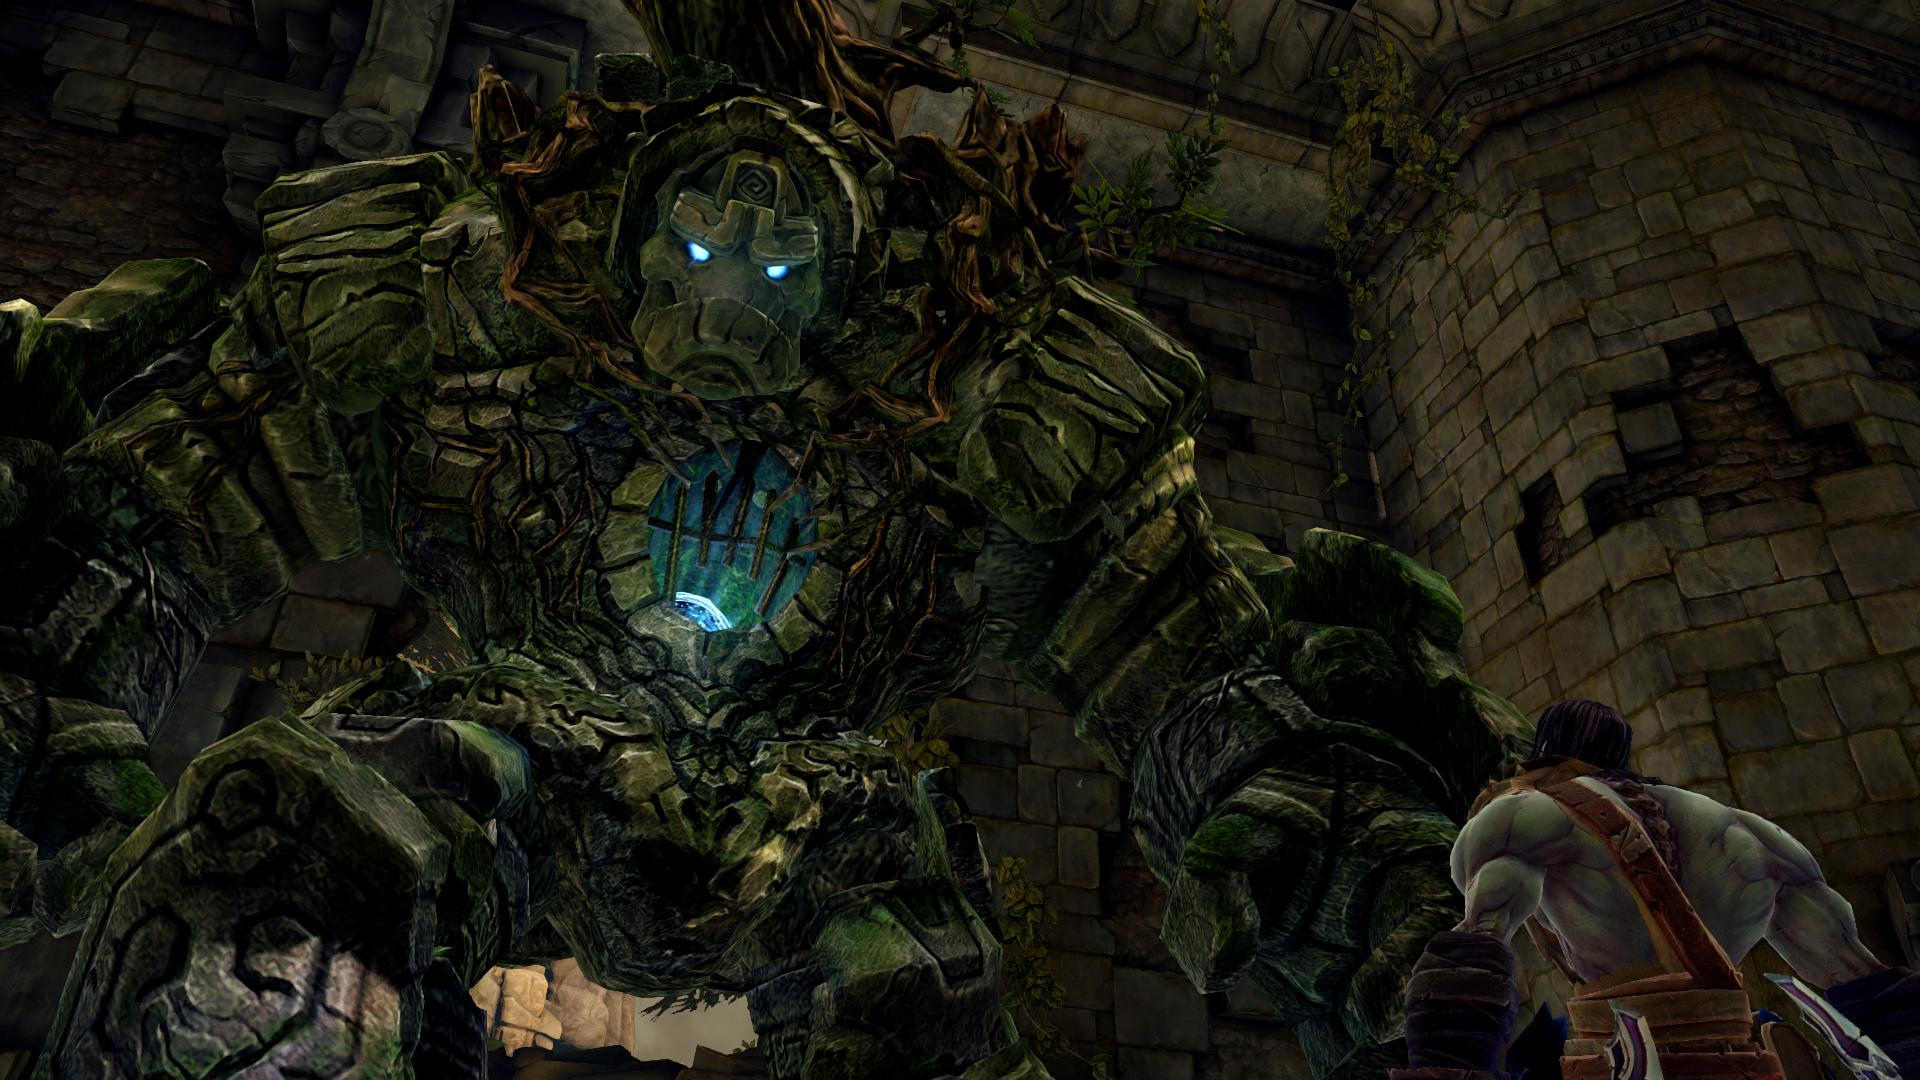 Darksiders 2 Deathinitive Edition Screenshot 1